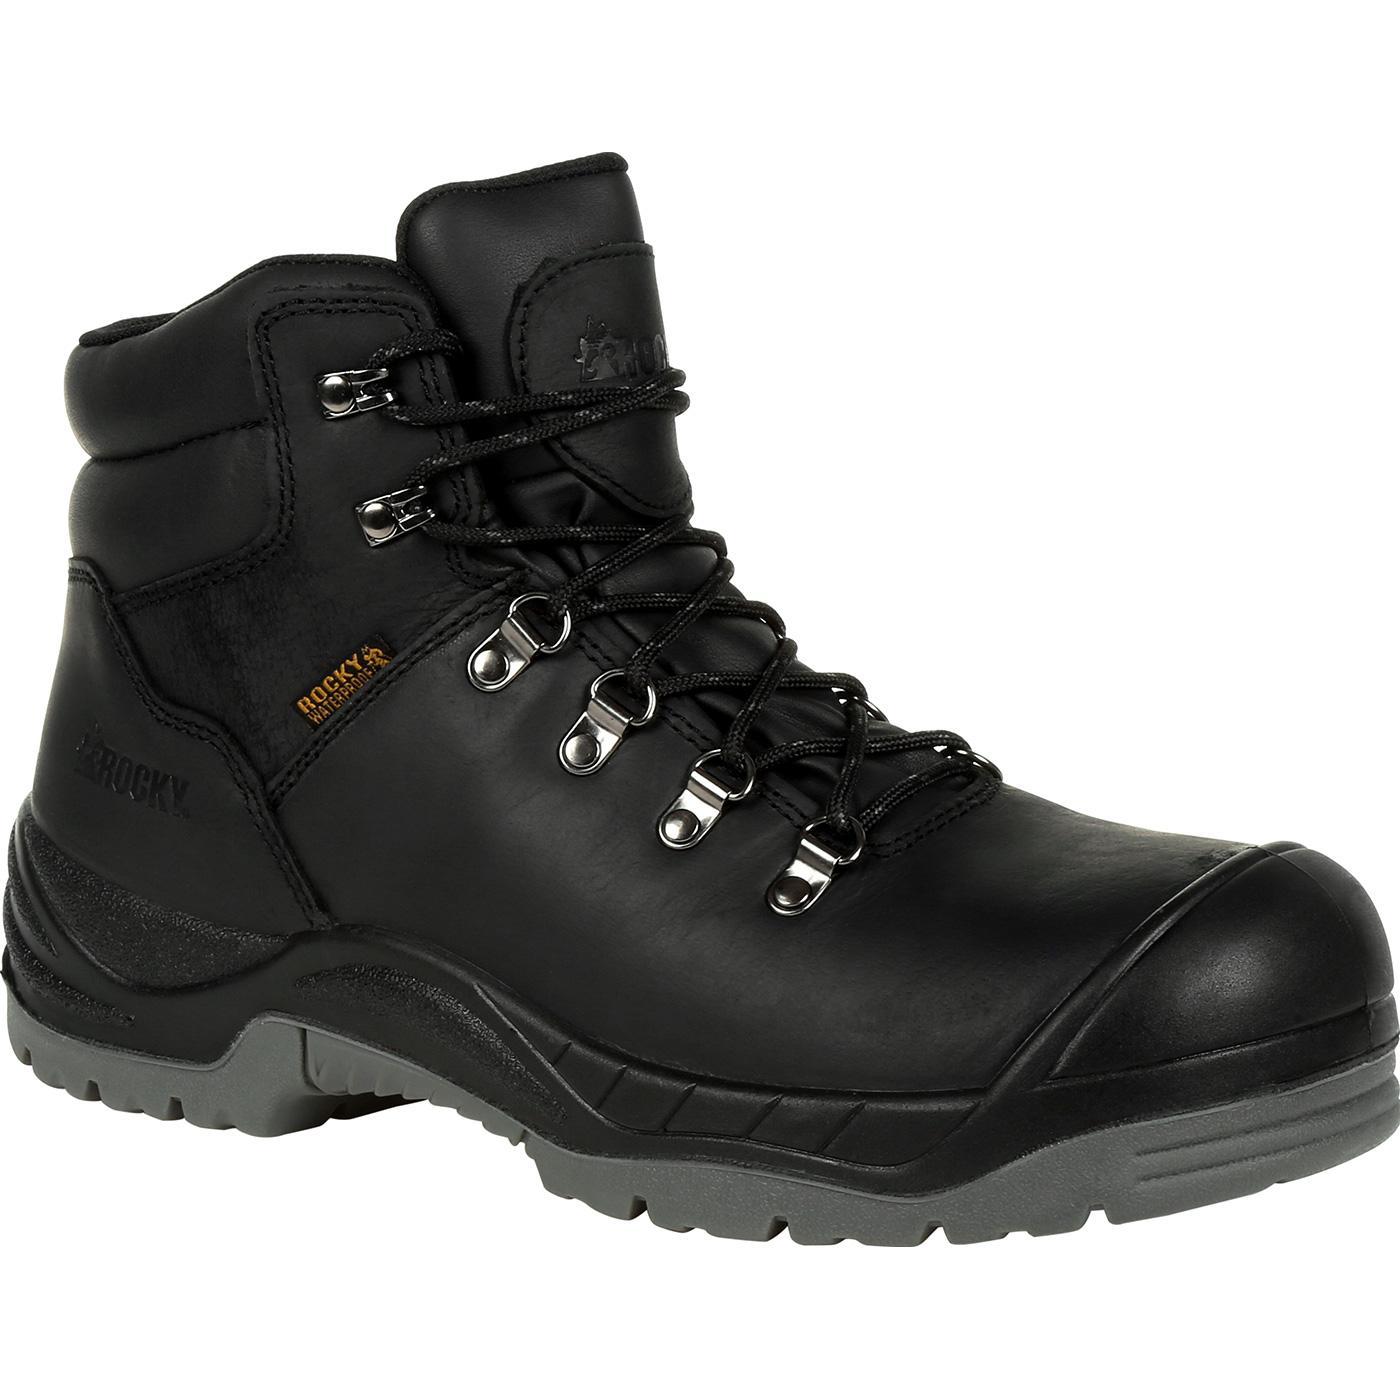 0c93ade05a34 Rocky Direct Attach  Men s Composite Tow Waterproof Work Hiker  RKK0244